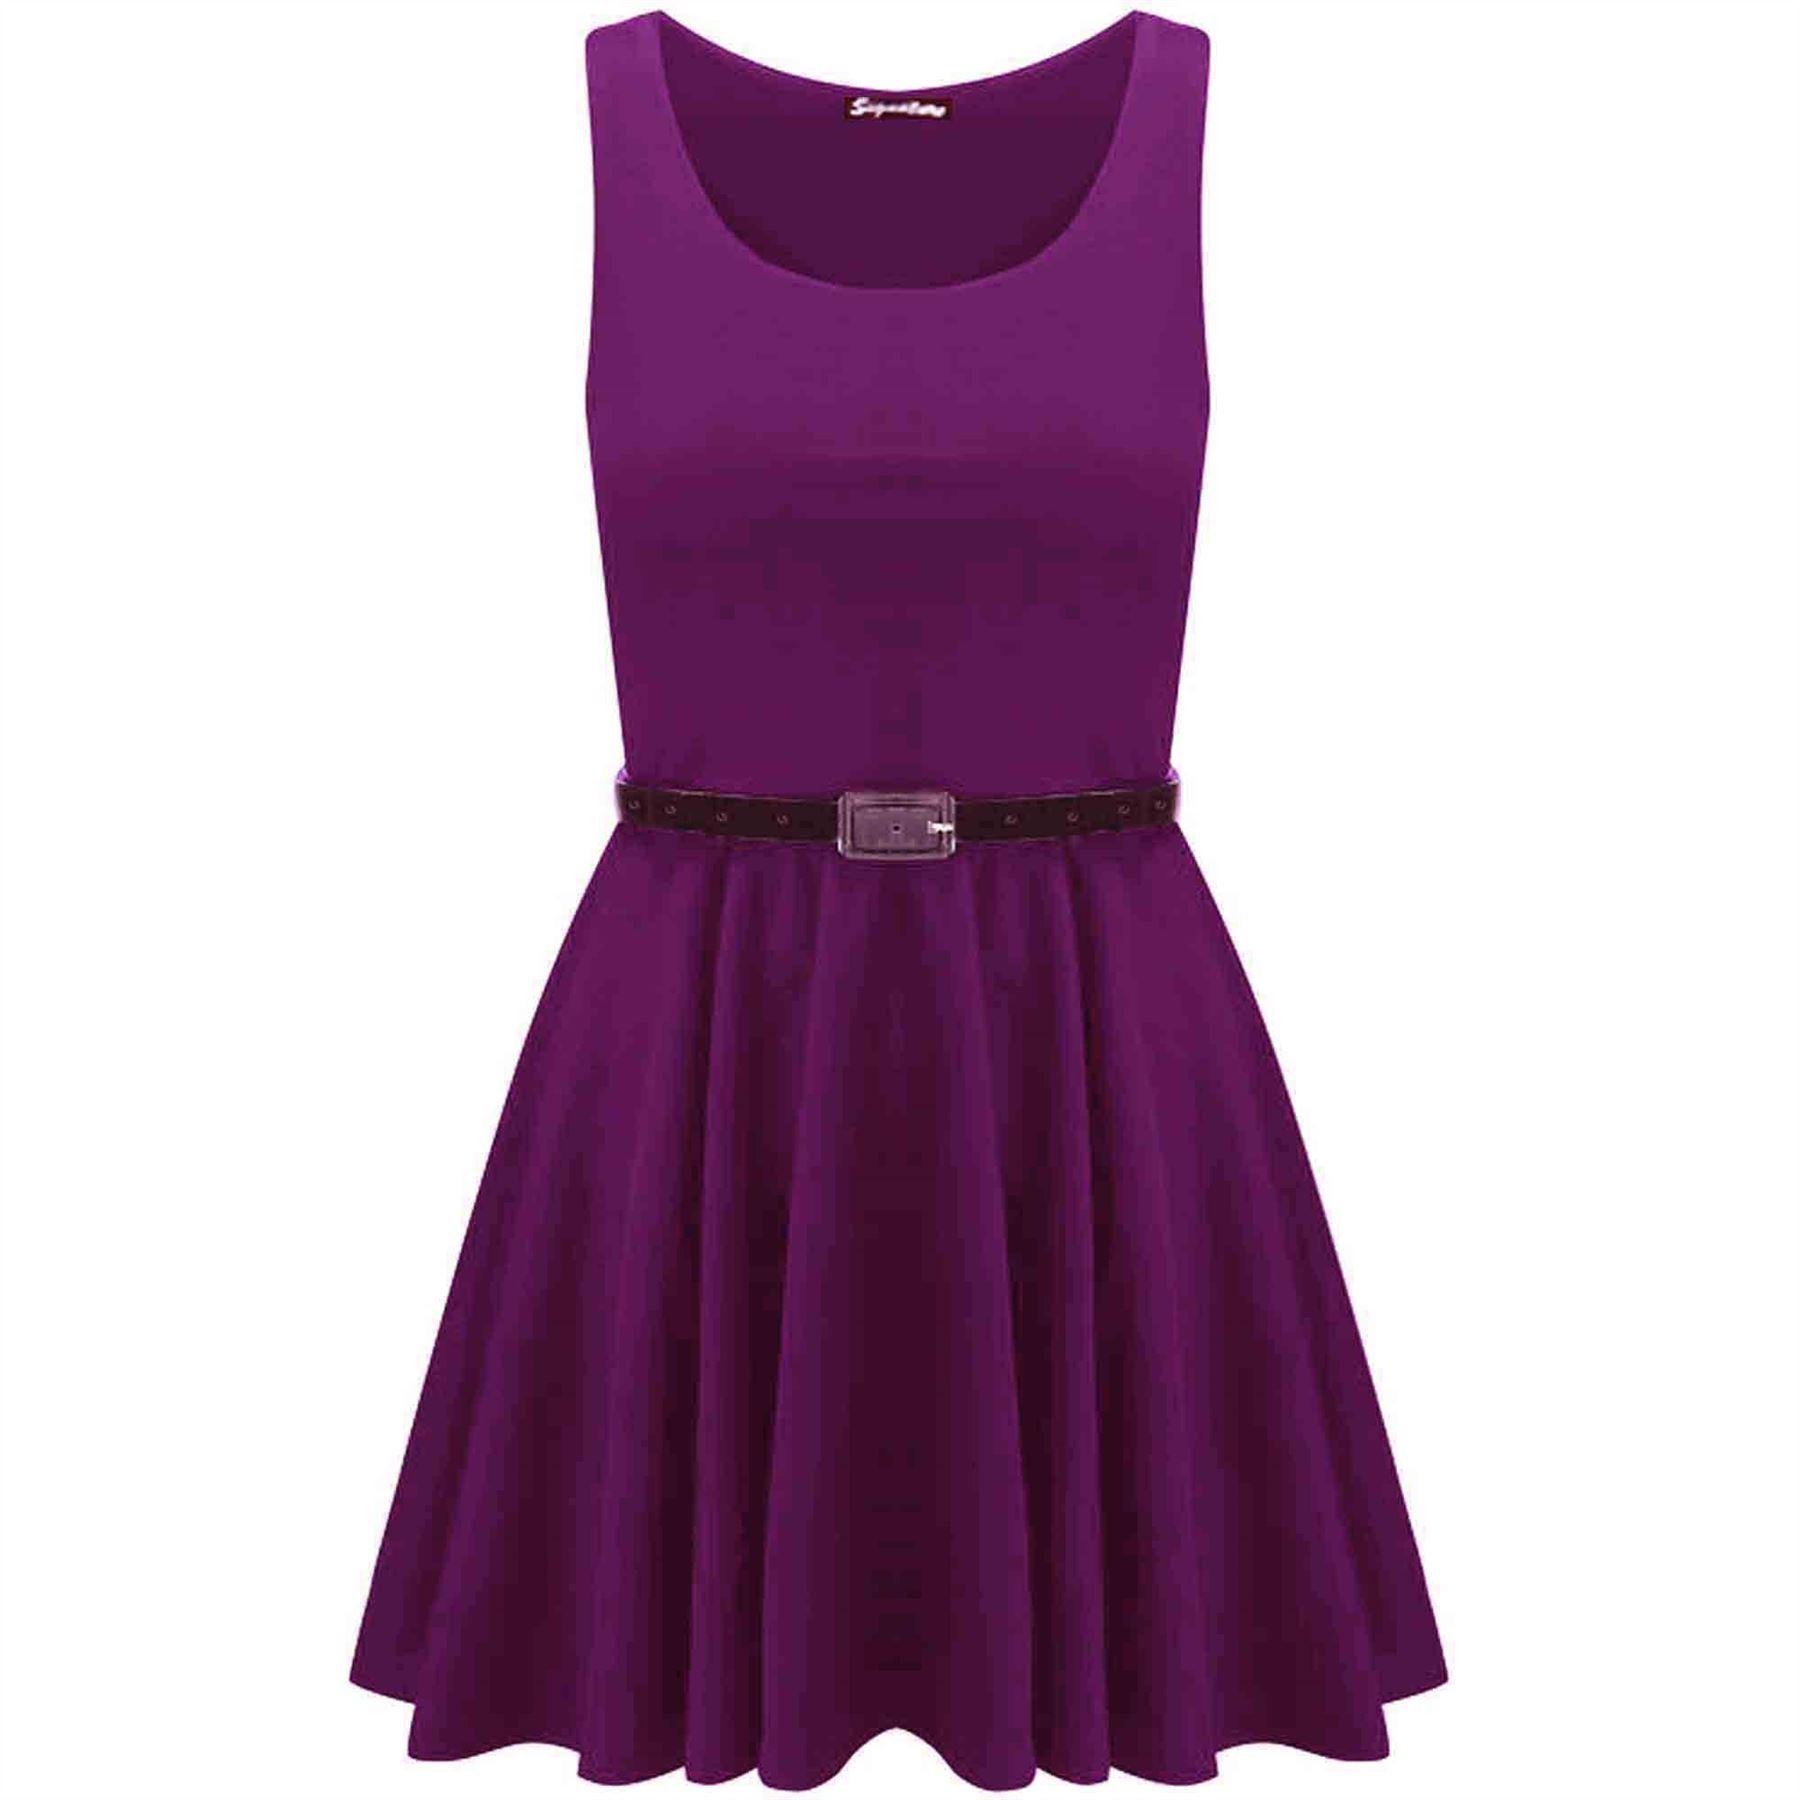 Womens-Sleeveless-Flared-Franki-Party-Ladies-Plus-Size-Skater-Dress-Top-16-26